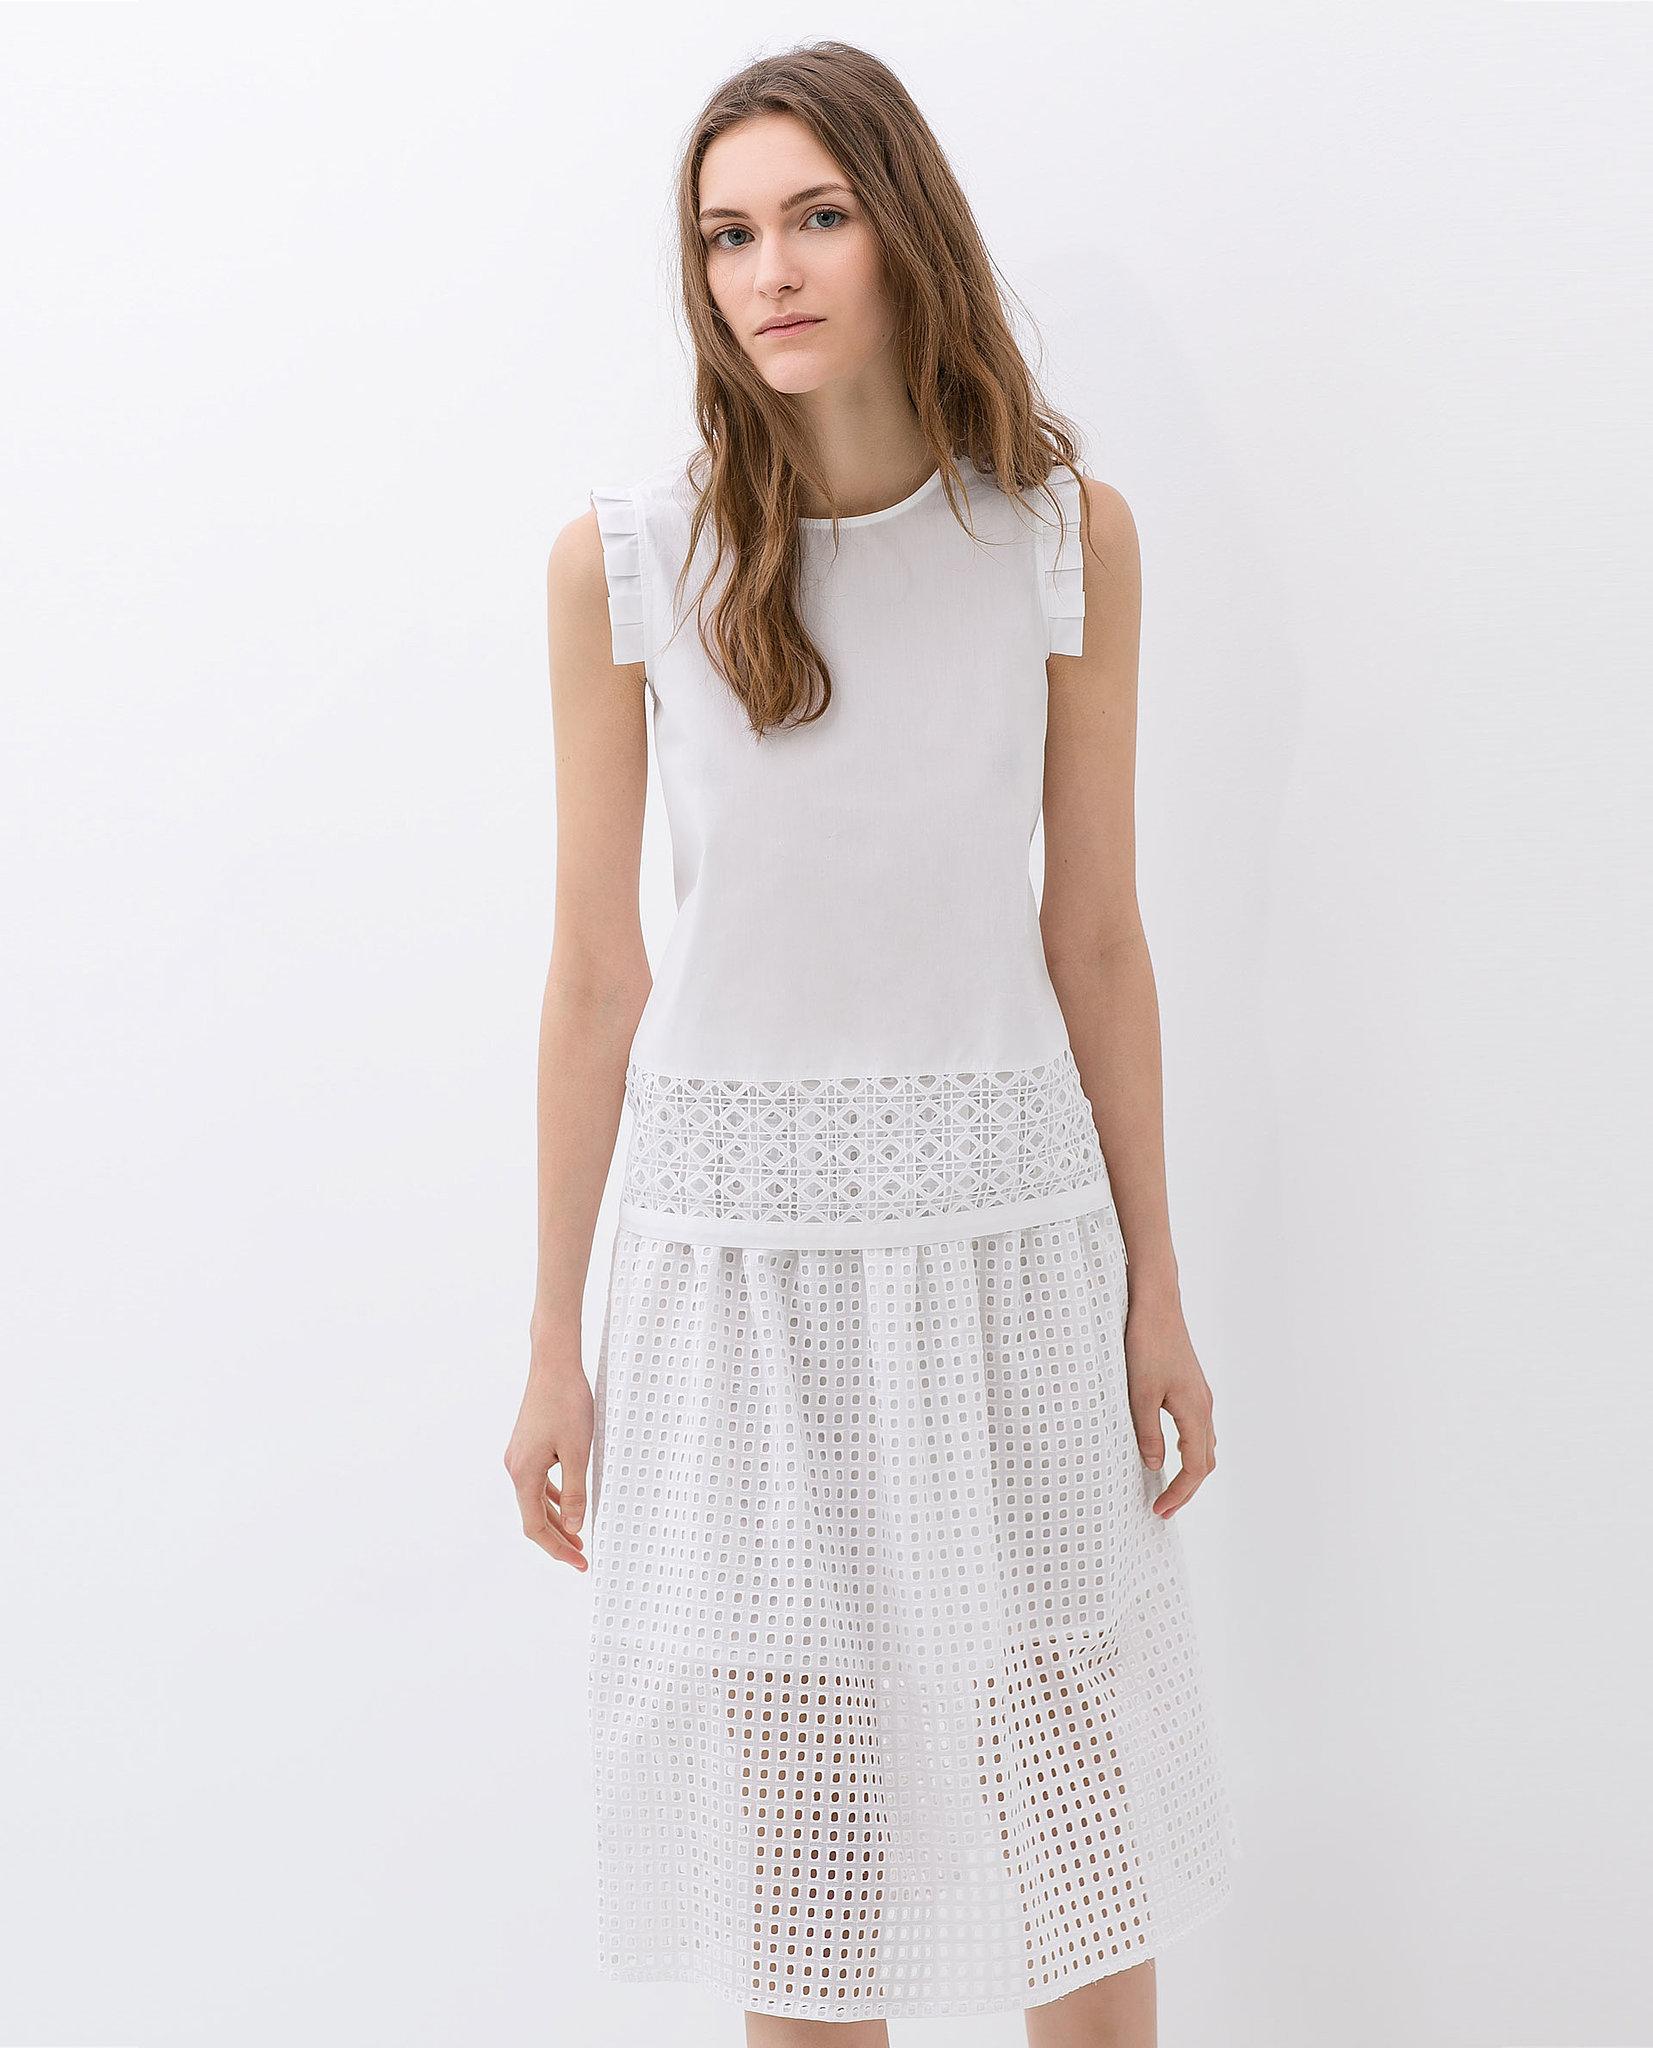 Zara Cut Work Skirt ($80)